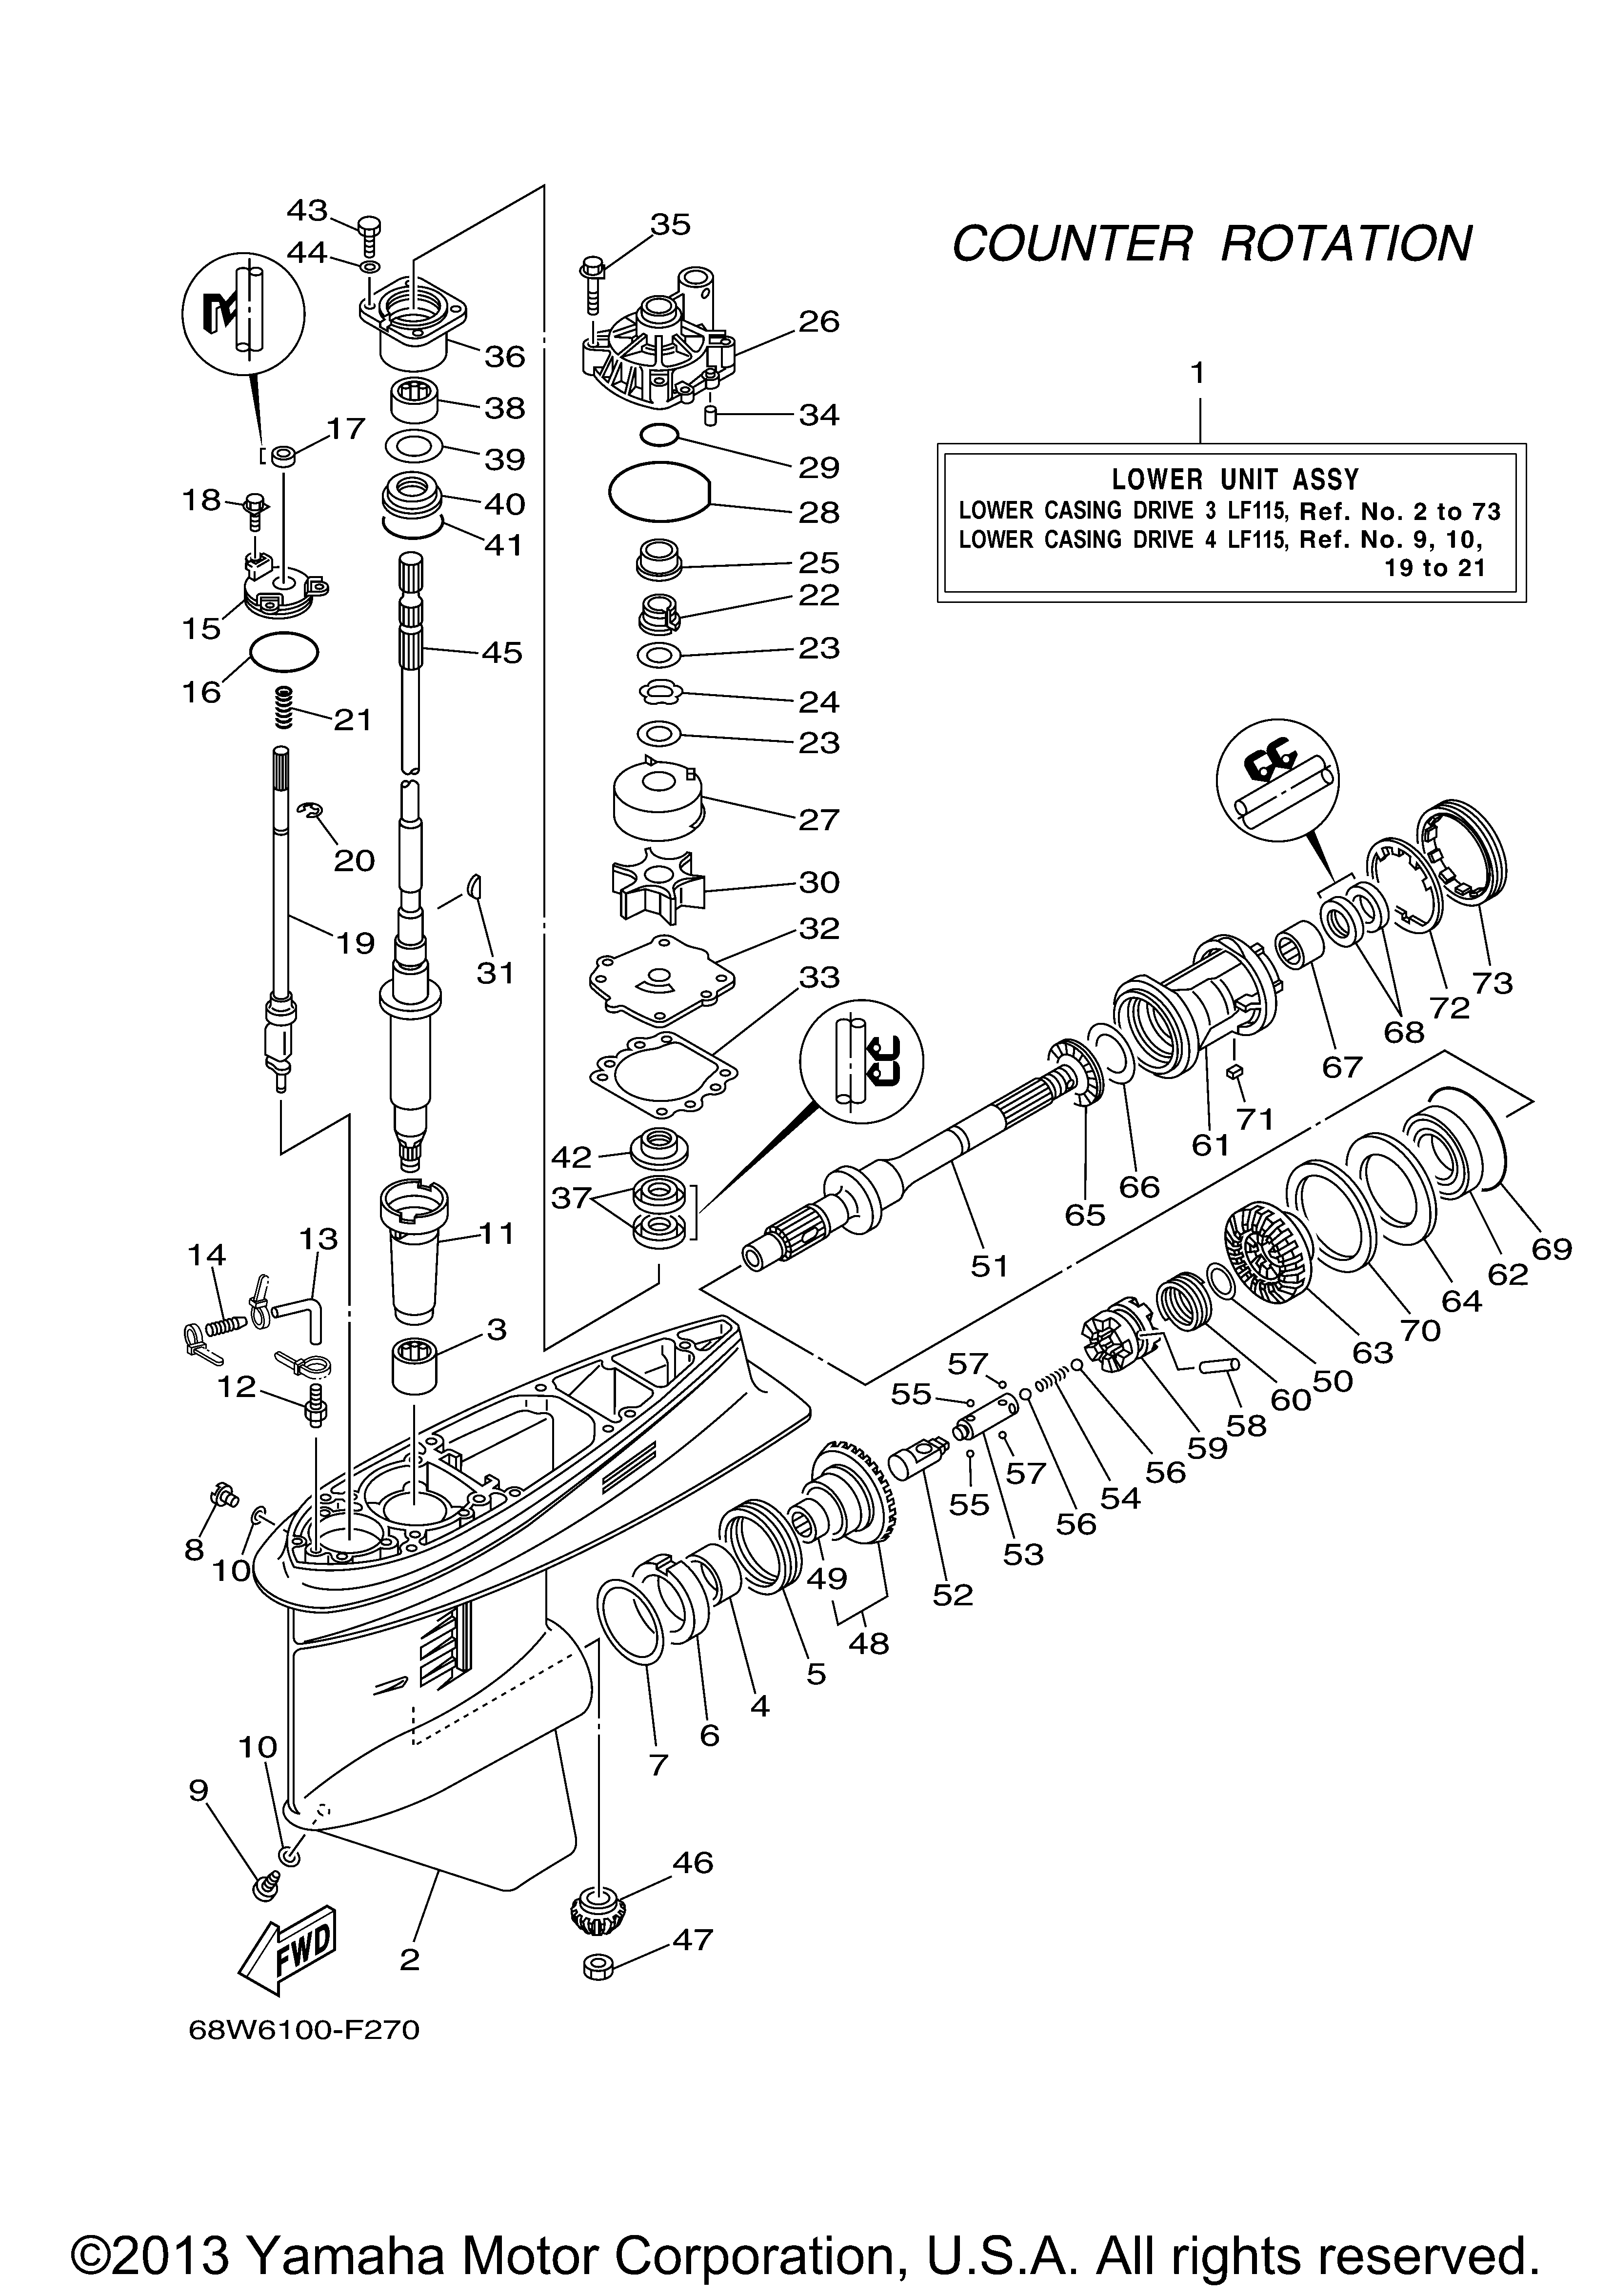 Yamaha   OUTBOARD   115 HP   F115TXR   LOWER CASING DRIVE 3 LF115